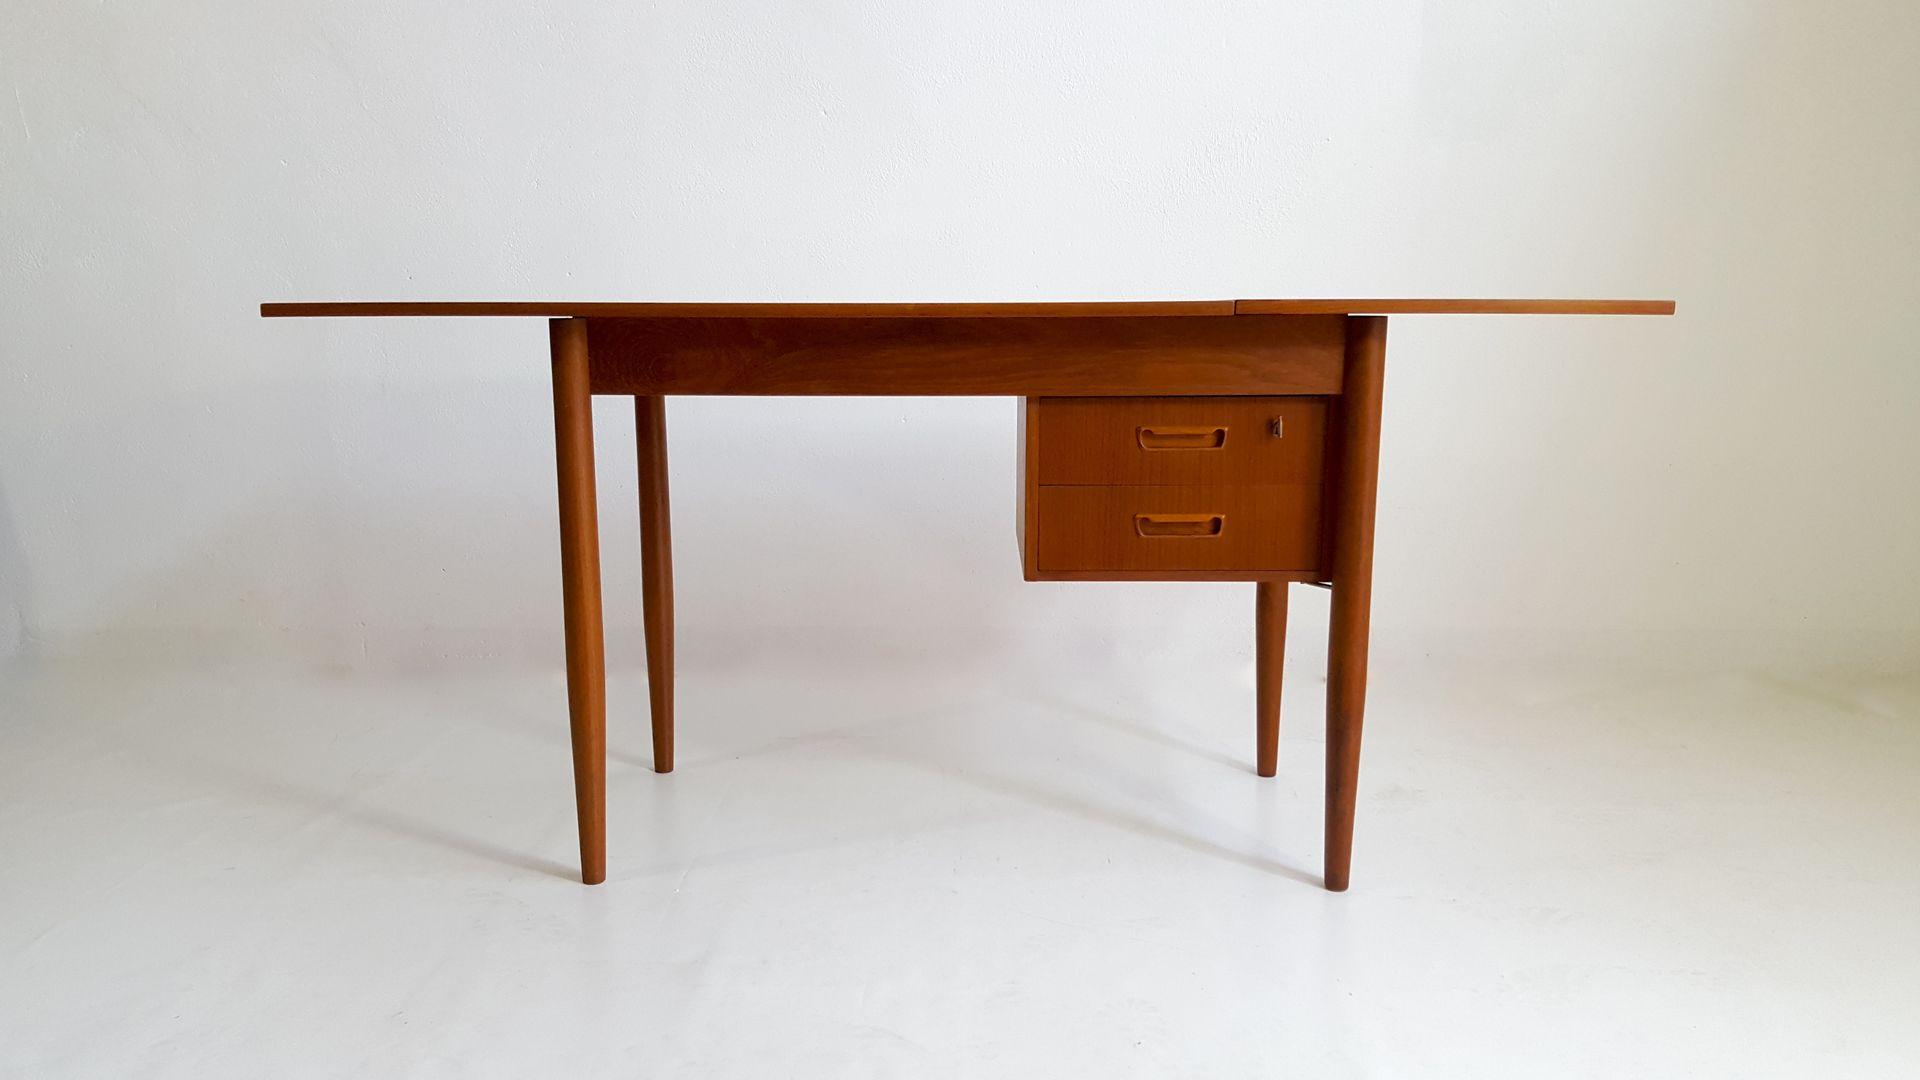 Scrivania Vintage Usata : Scrivania vintage. scrivania. elegante scrivania vintage anni. usato